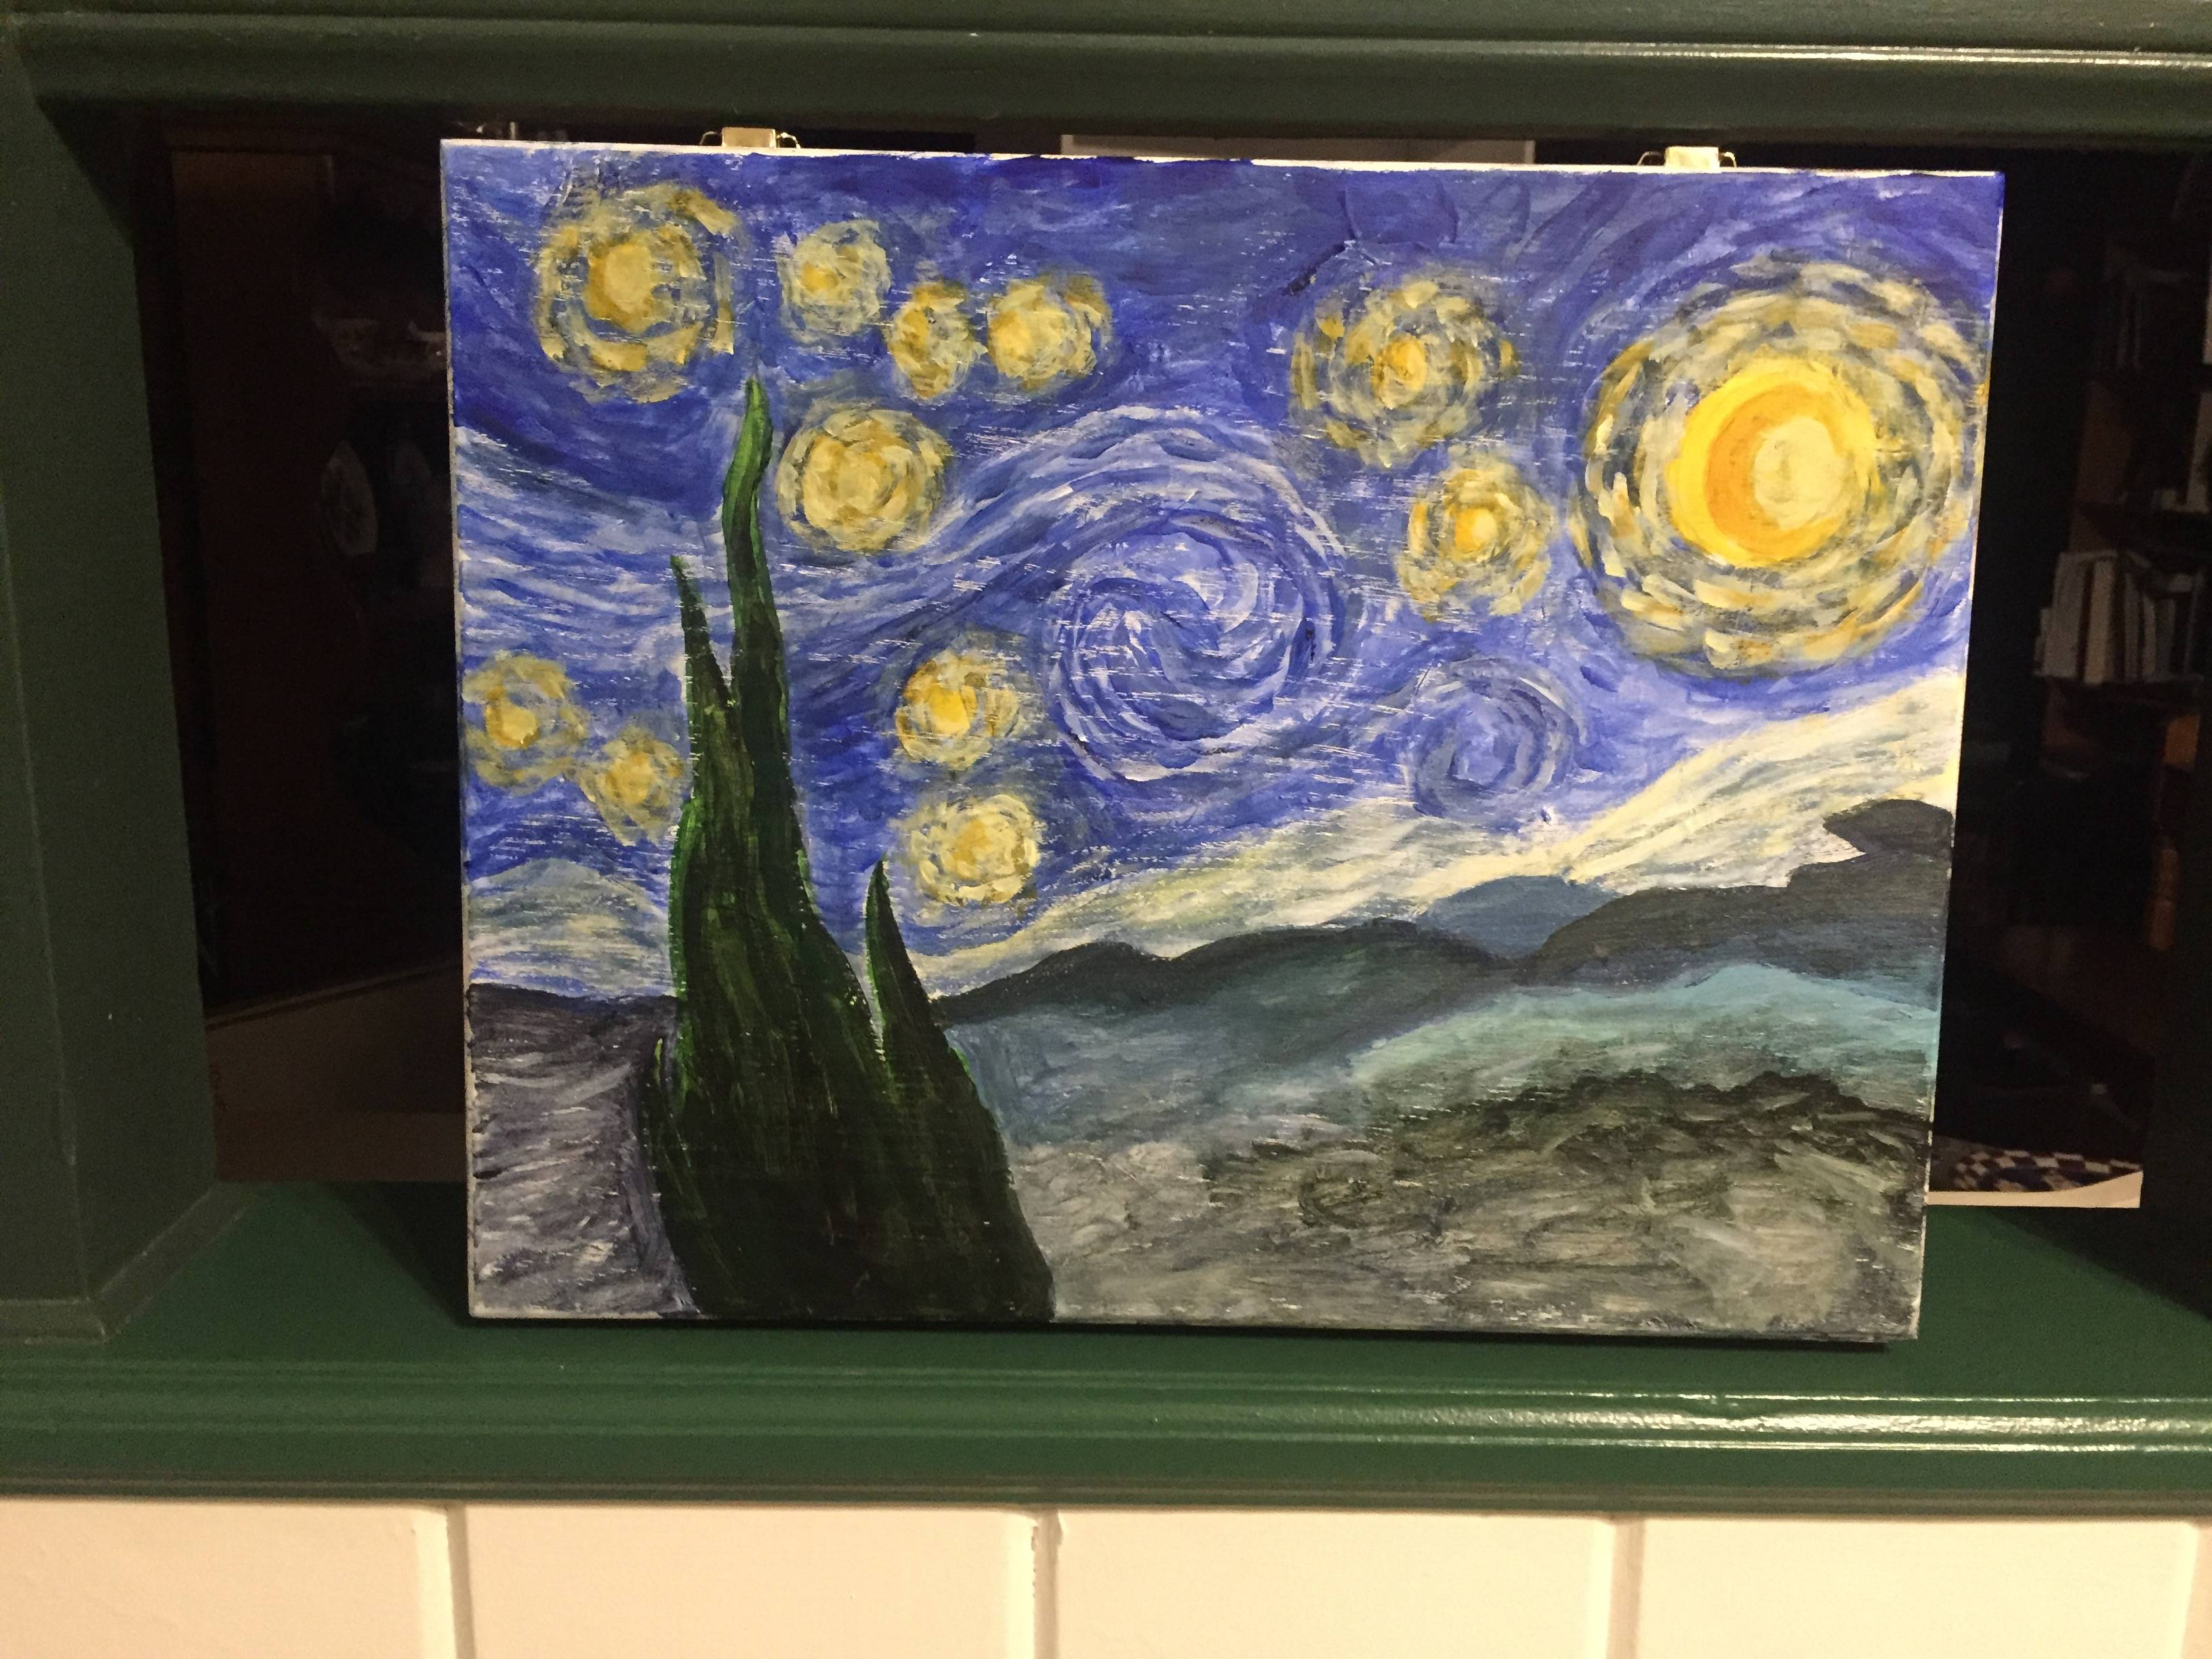 Starry Night on an art box